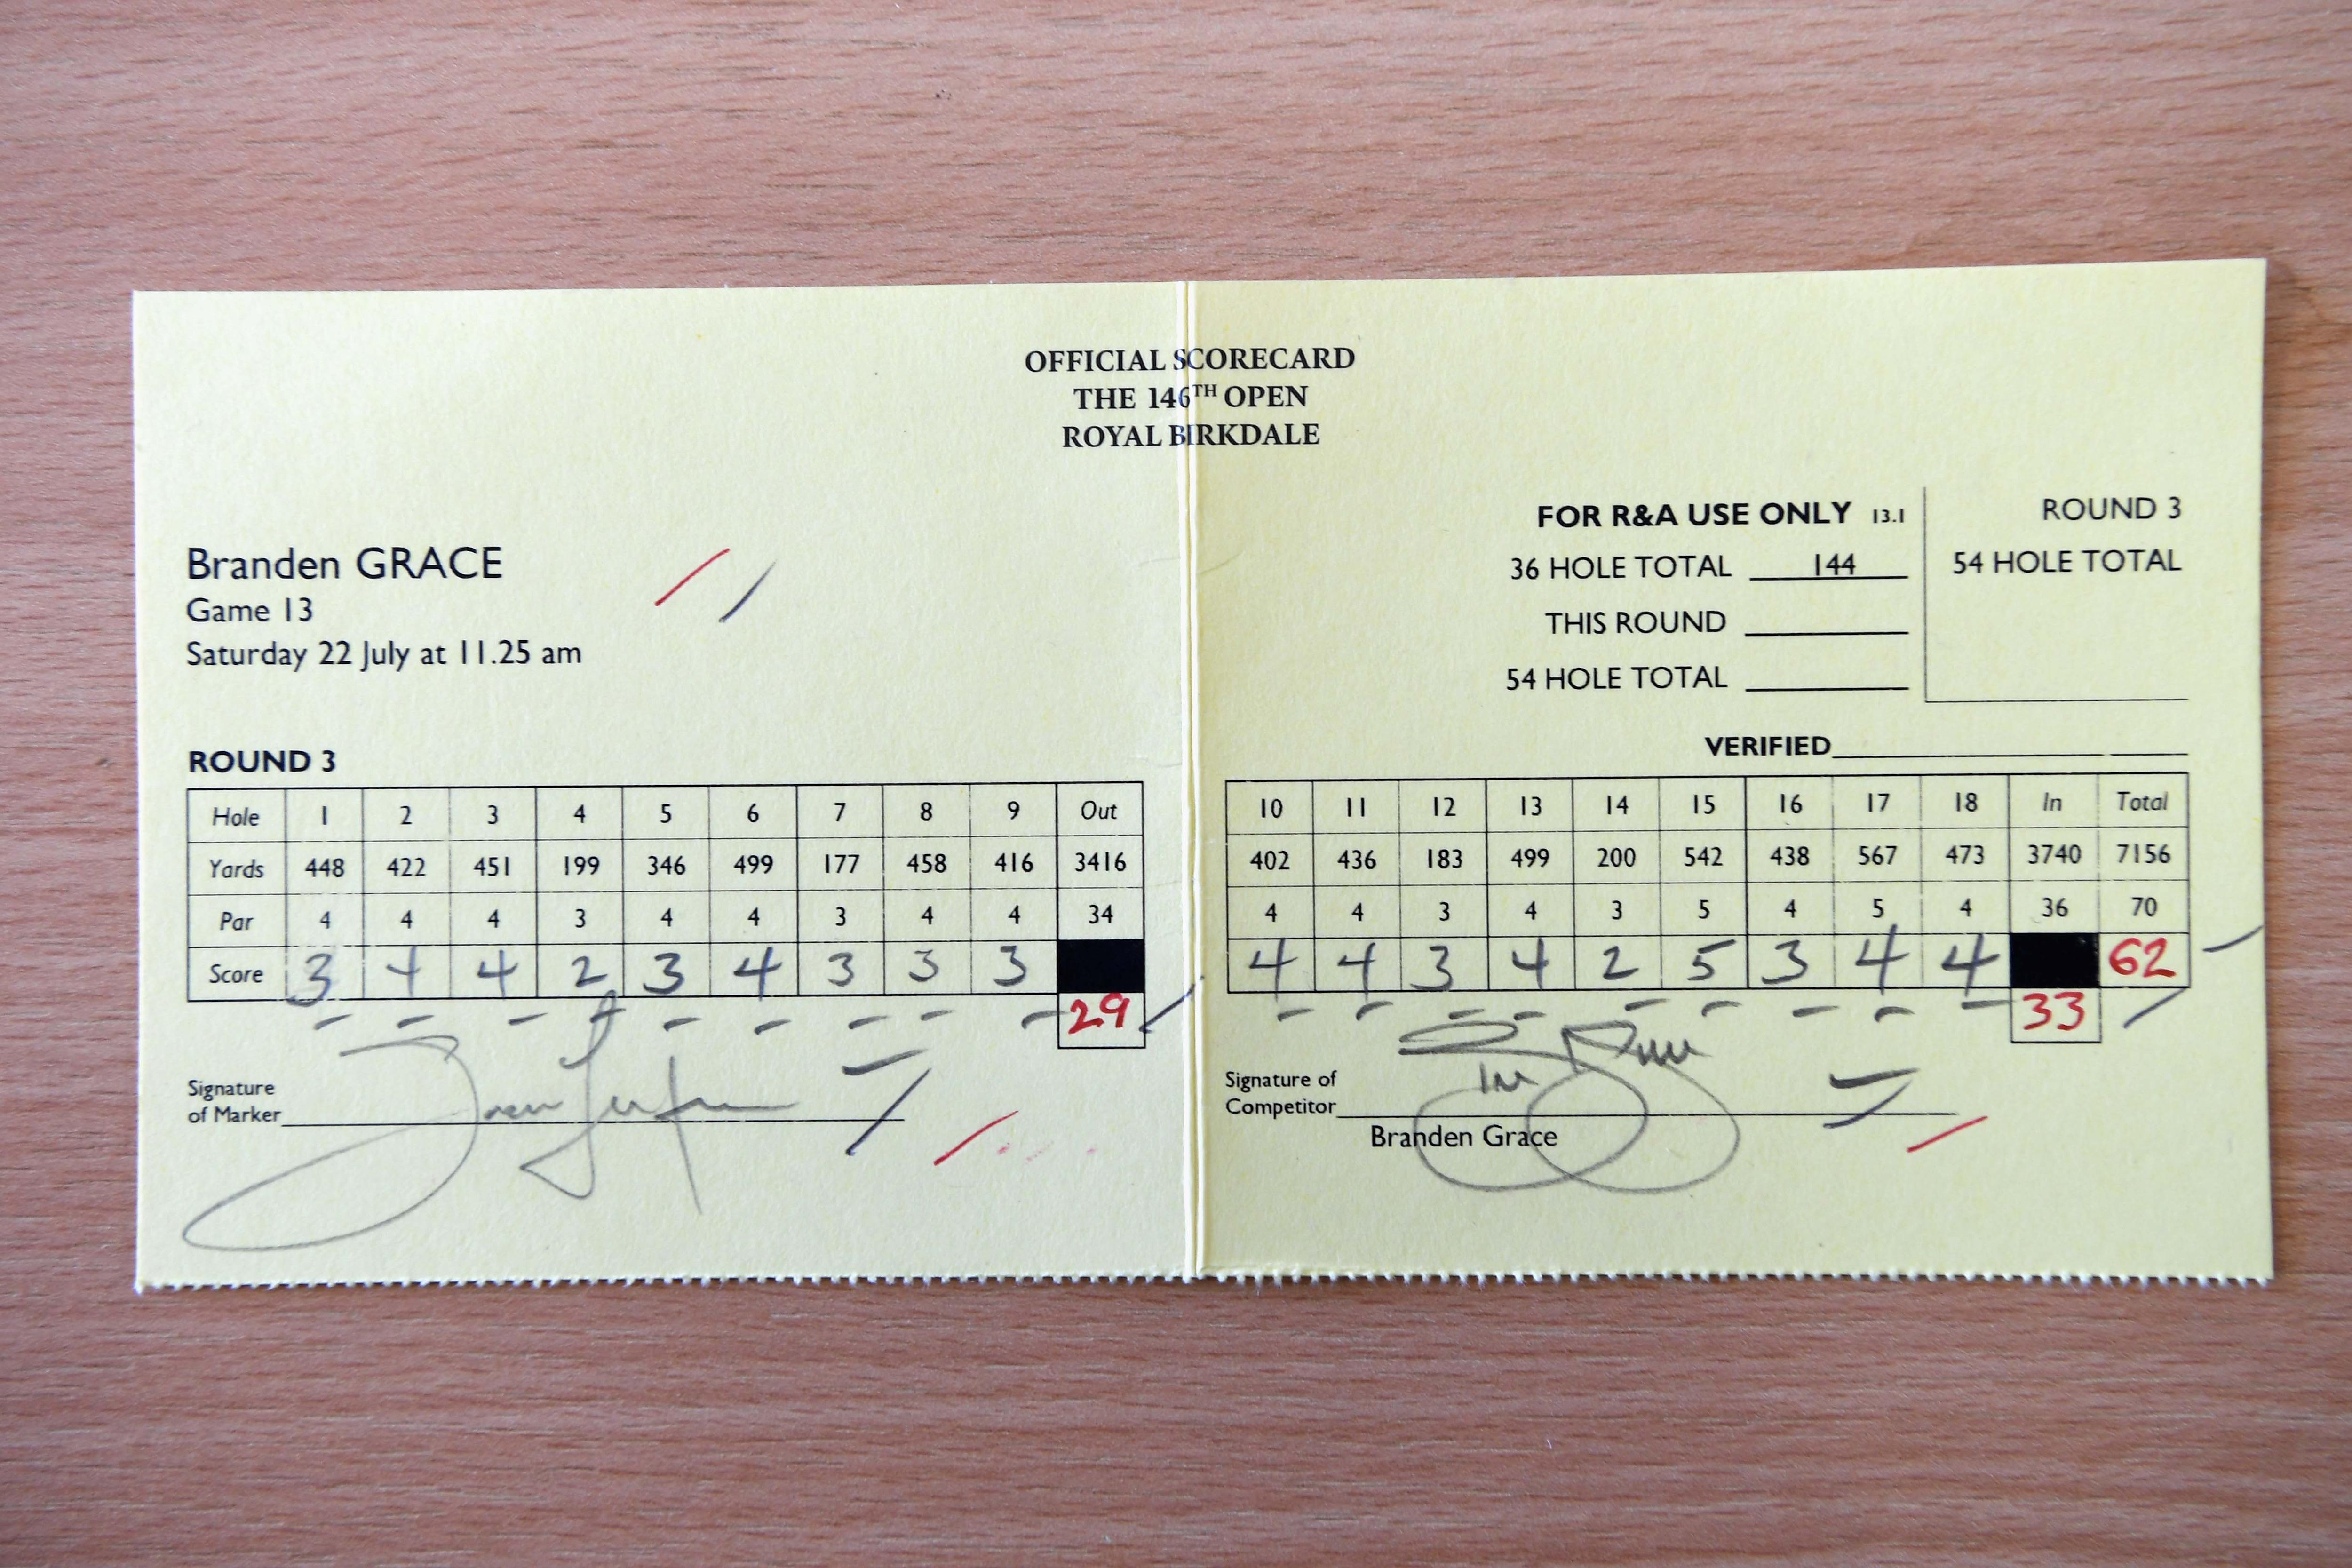 Branden Grace's scorecard